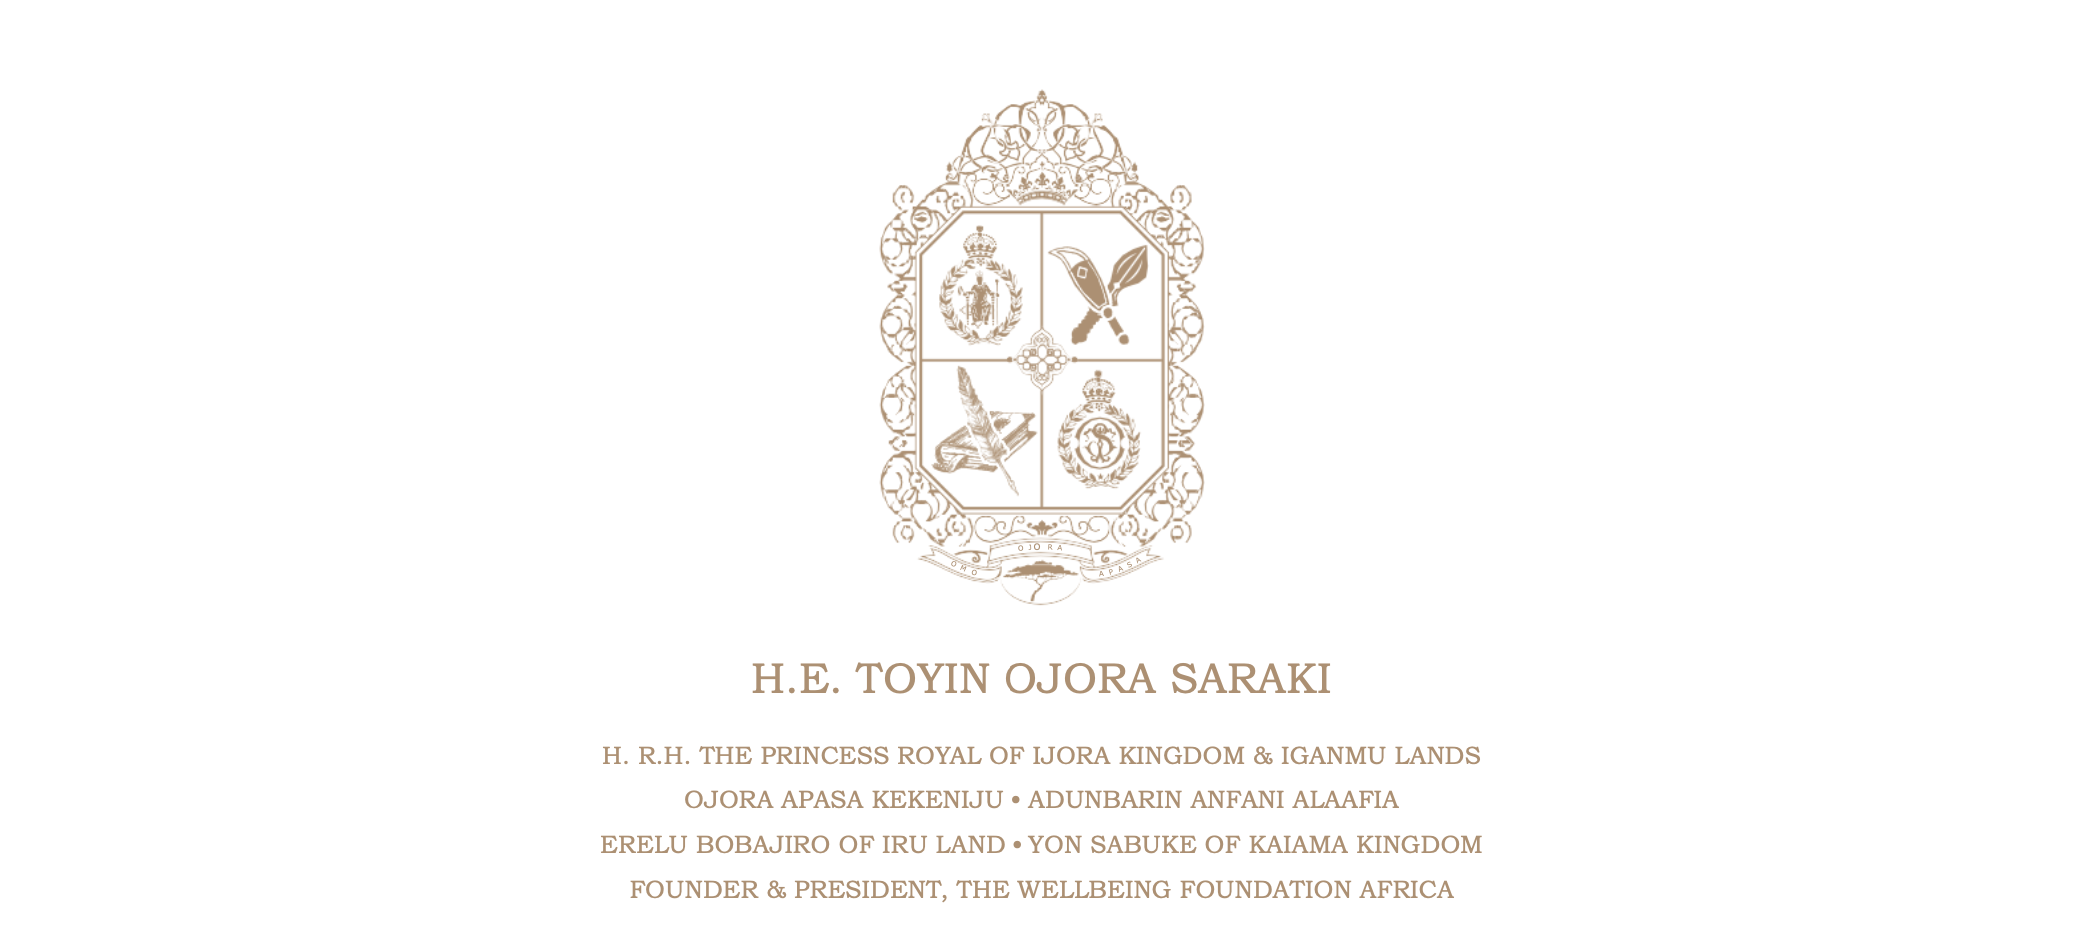 ERELU BOBAJIRO OF IRU LAND TRADITIONAL IWUYE CEREMONY & THE PRINCESS ROYAL OF IJORA KINGDOM AND IGANMU LANDS HOMECOMING APESIN PROCESSION